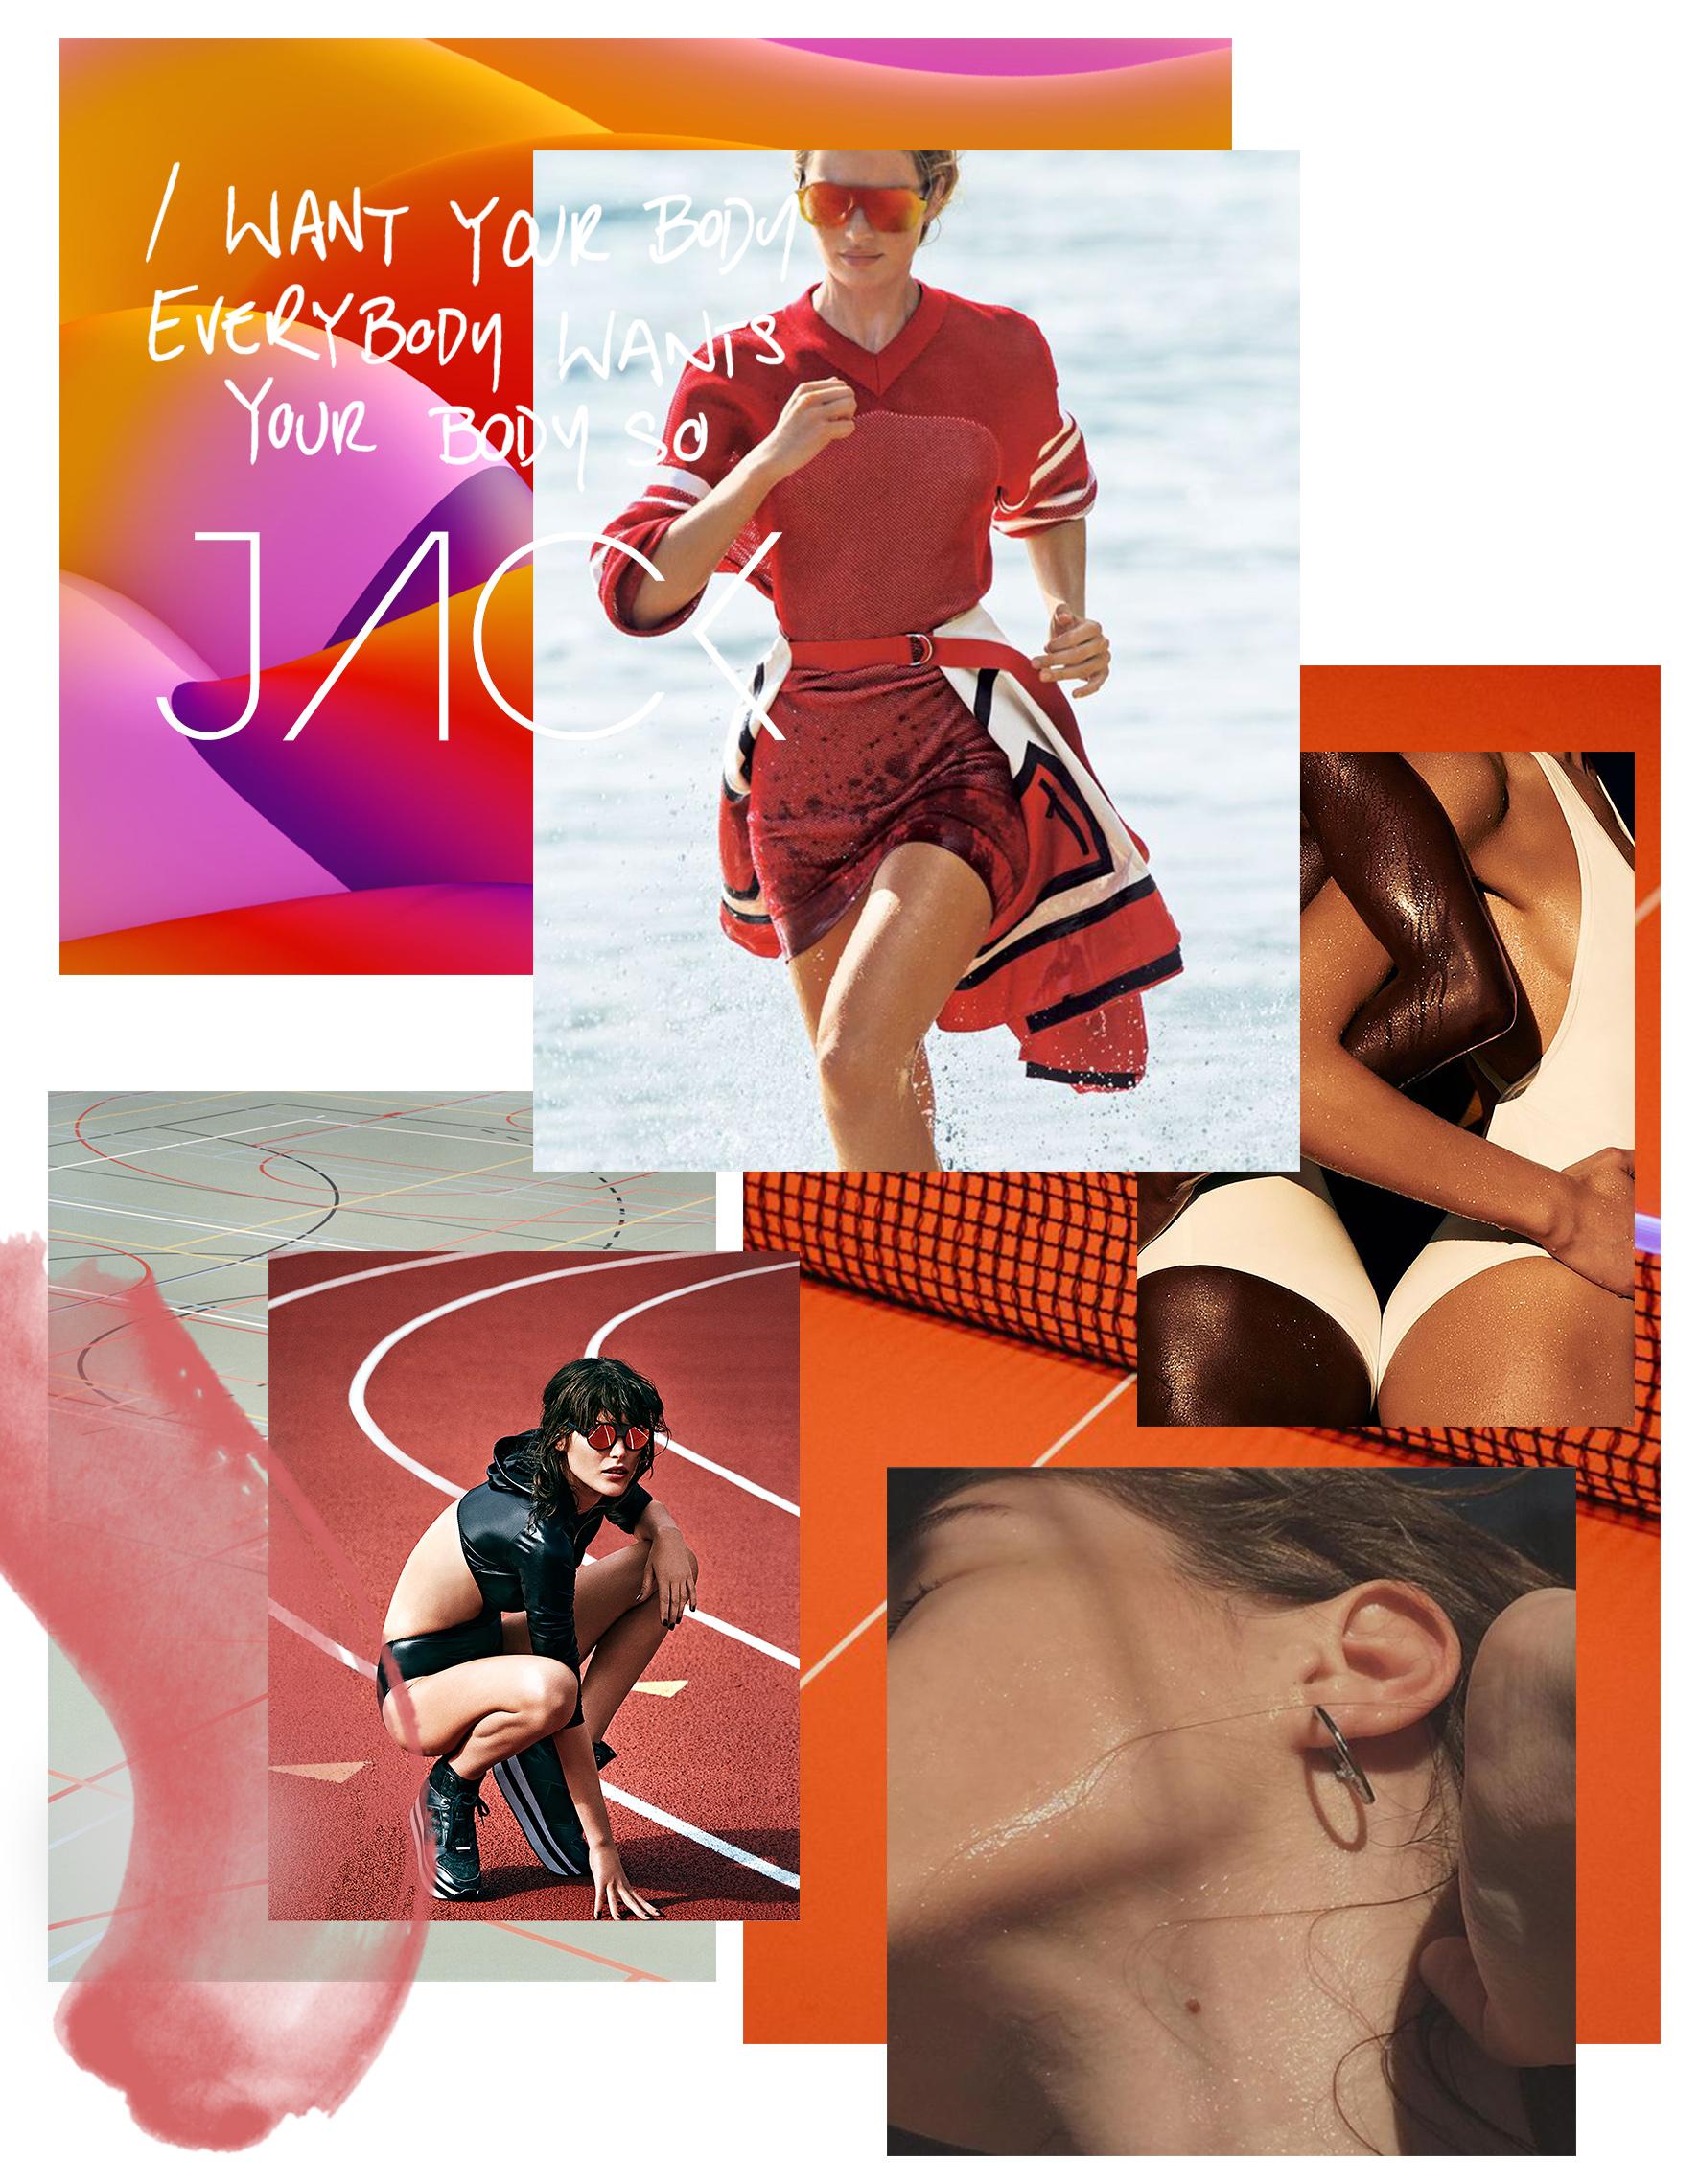 Swimsuit photography - Julia Noni /  Digital art - Velvet Spectrum /  Active photography - Sebastian Kim, James Macari